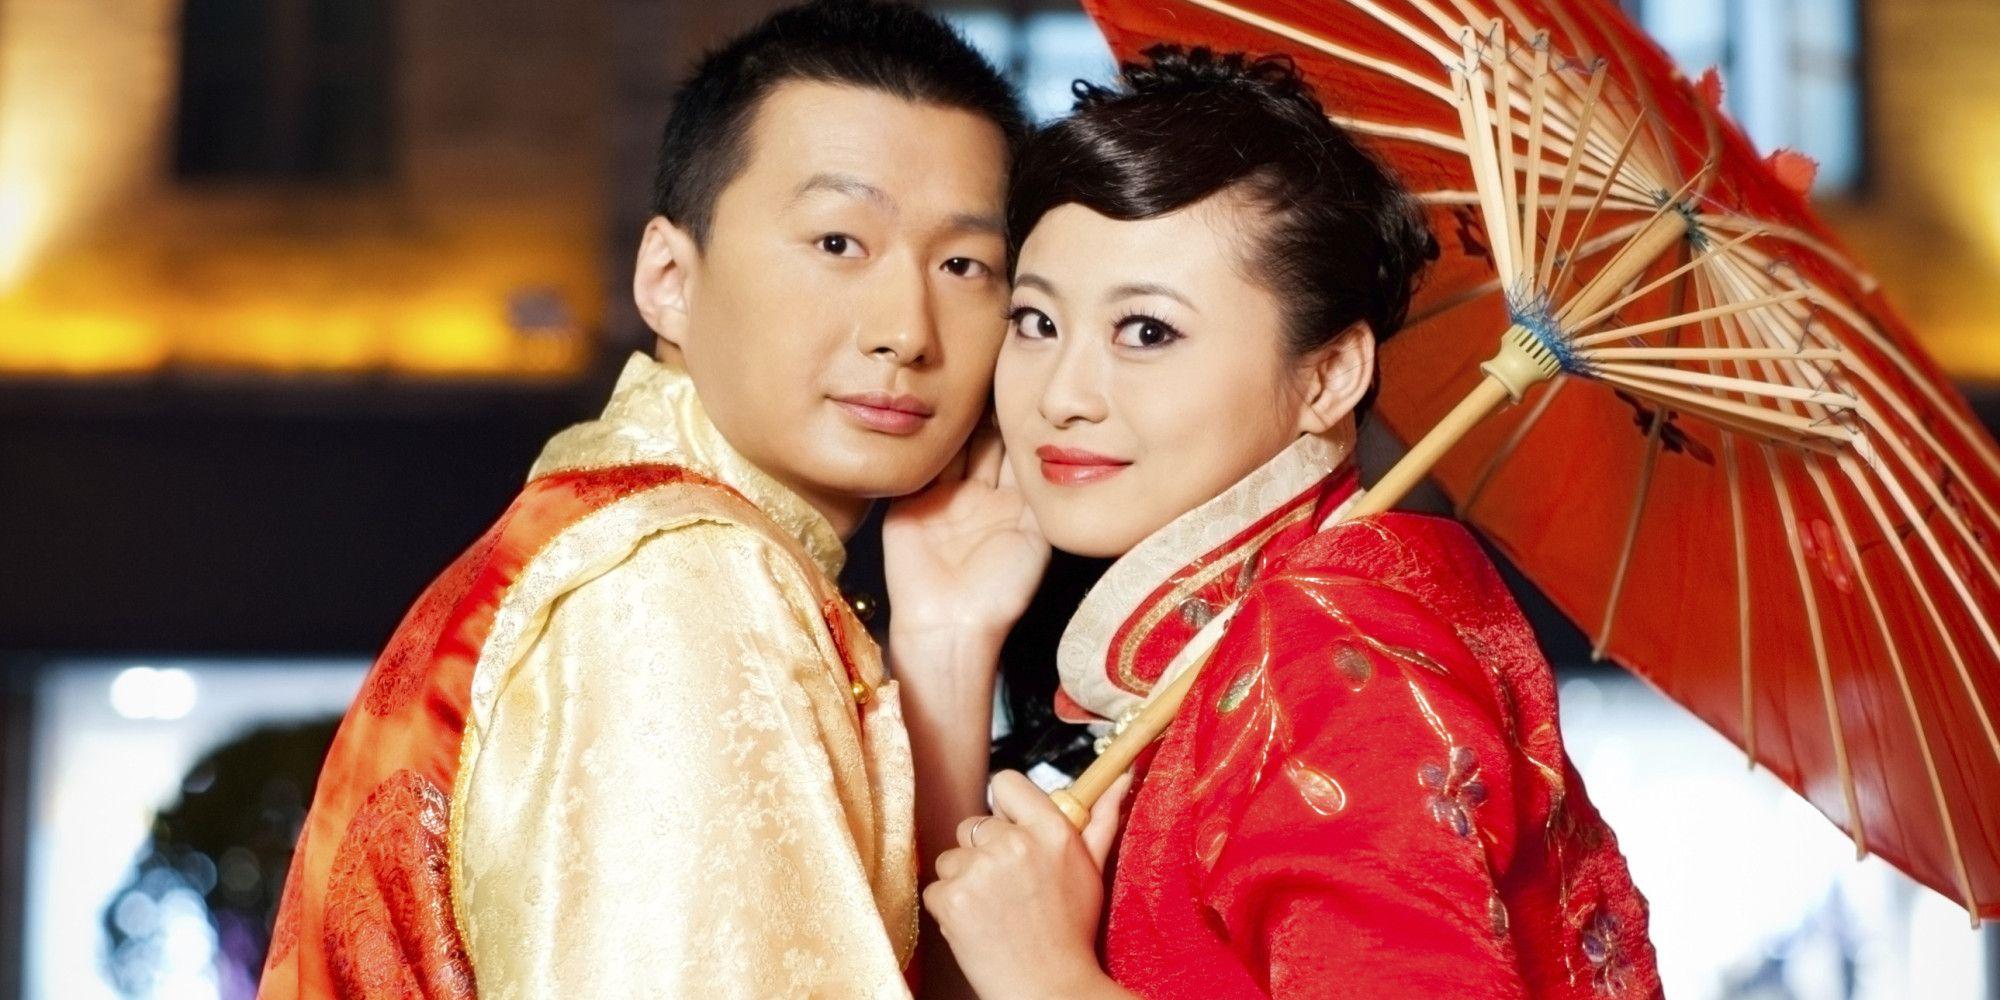 Wonderfull Chinese Wedding Guest Dress Etiquette Kse4